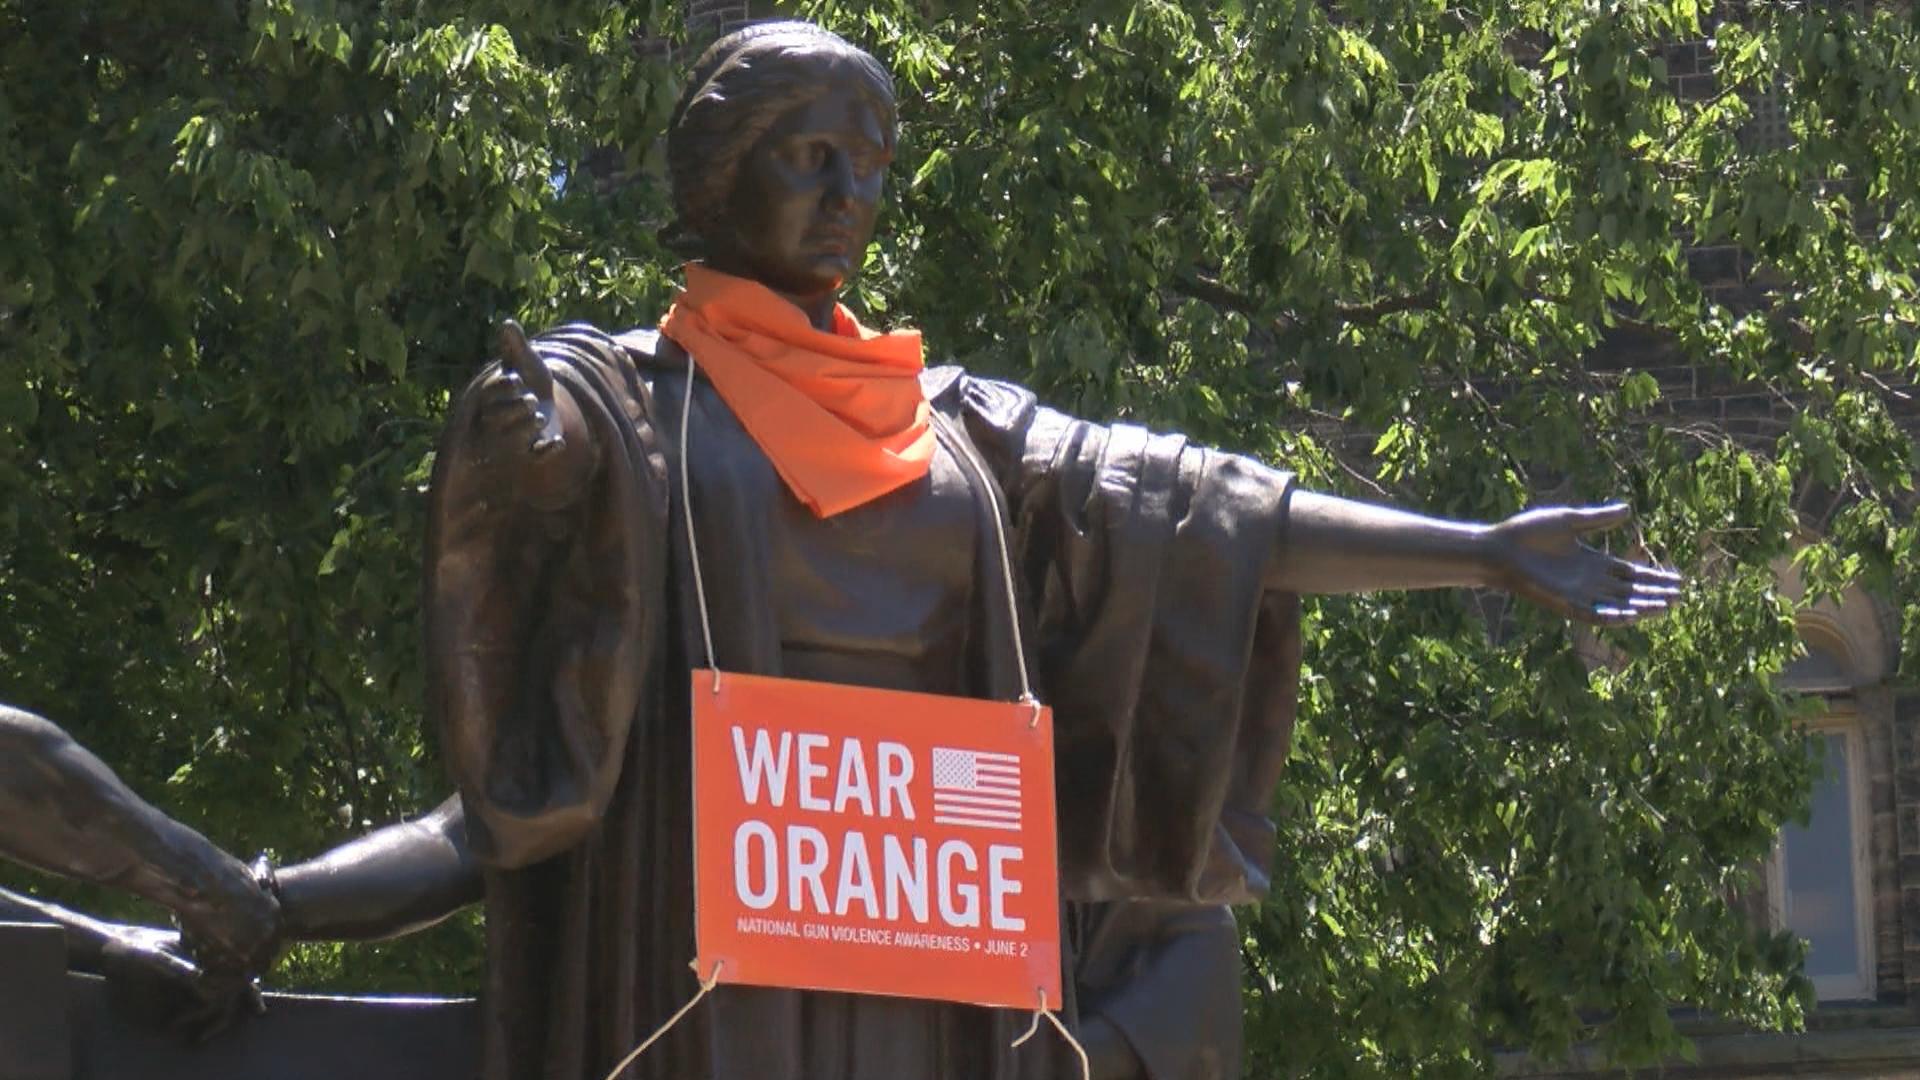 we wear orange_1496438571622.jpg